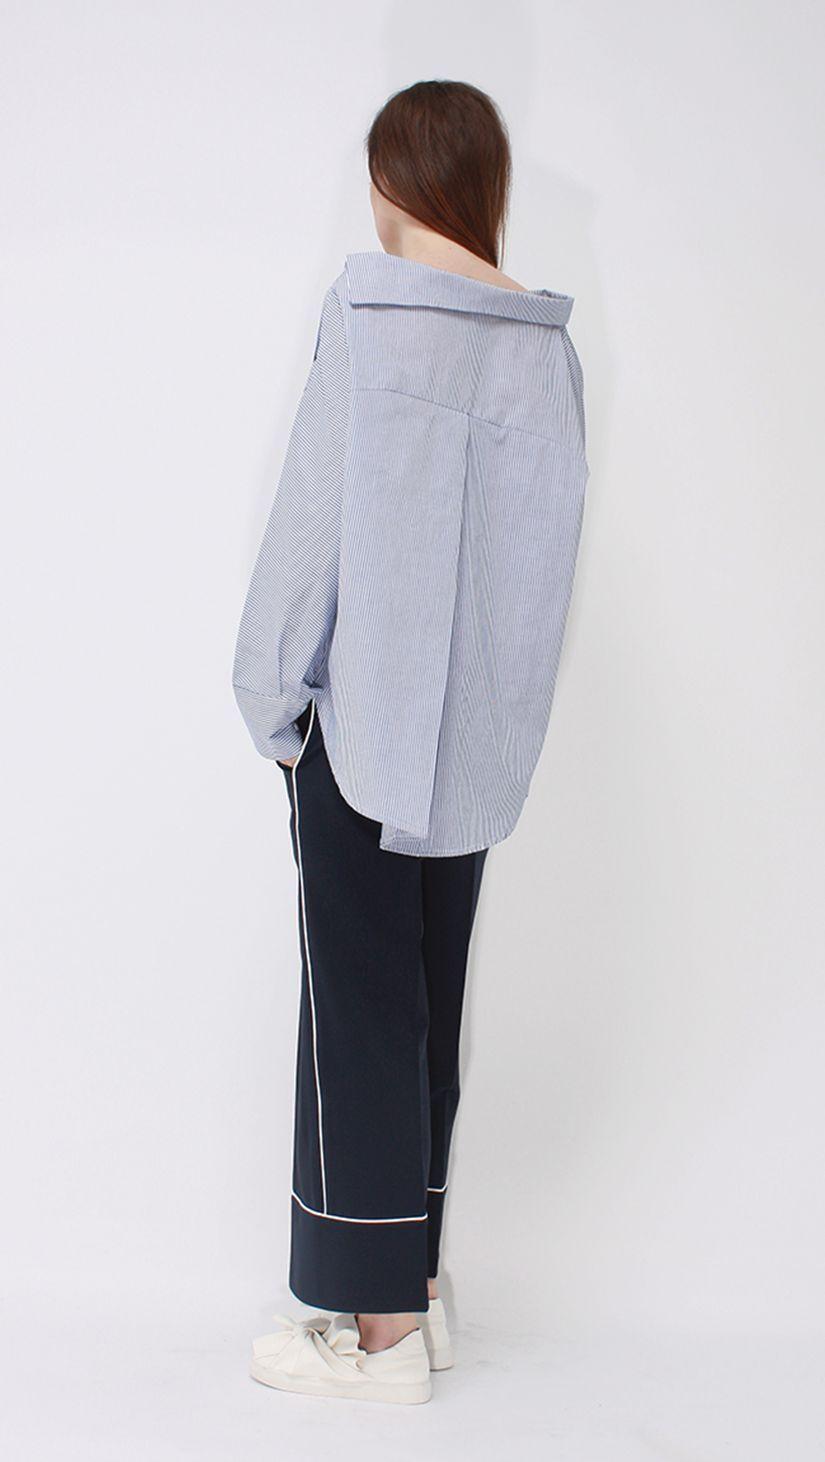 rama pajama shirt – LOÉIL